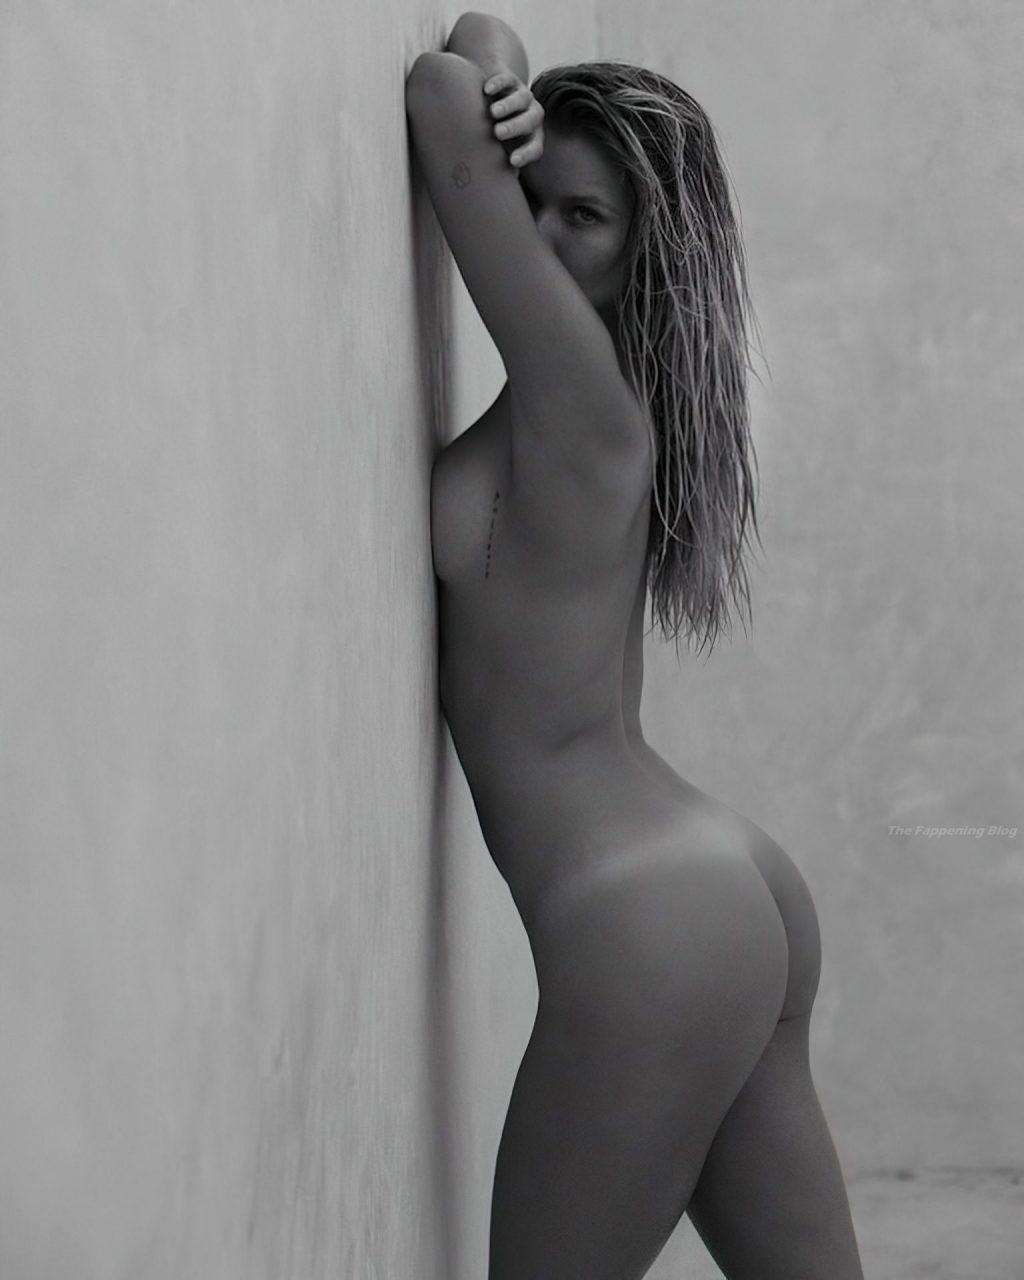 Josie Canseco Nude (13 Photos)